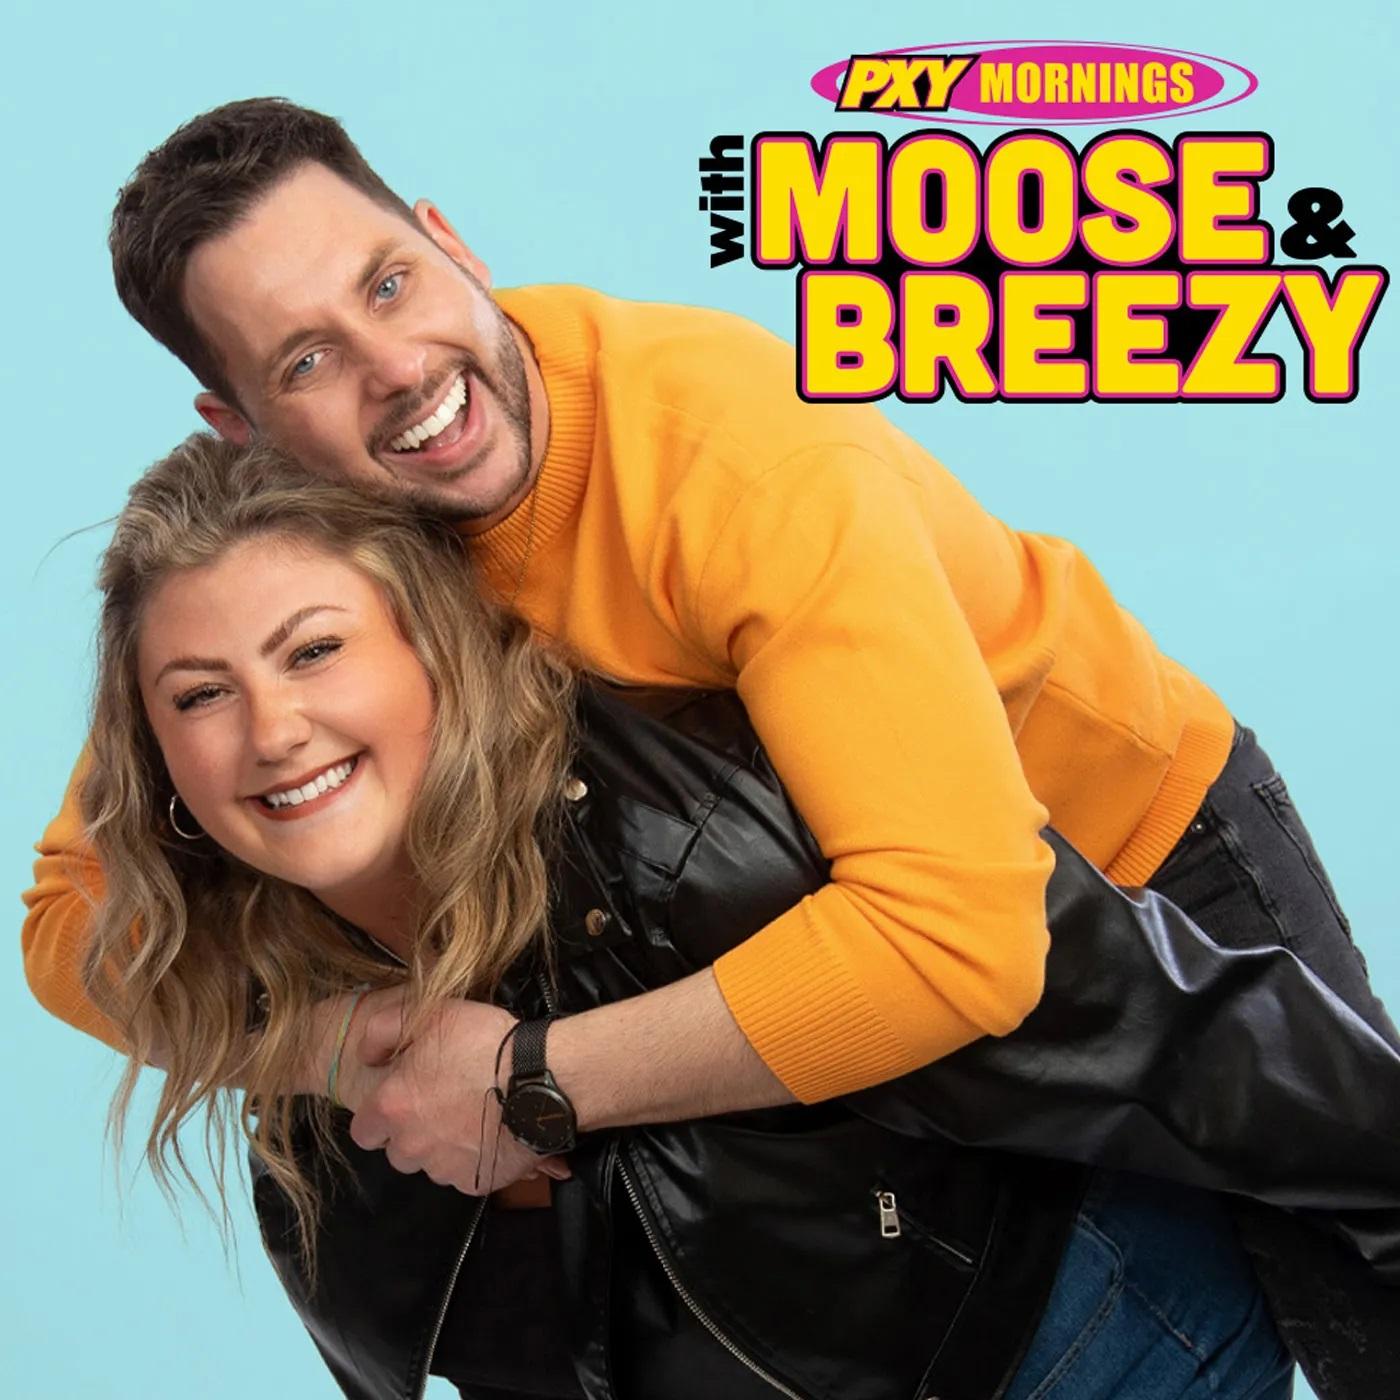 #TeamPXY On Demand